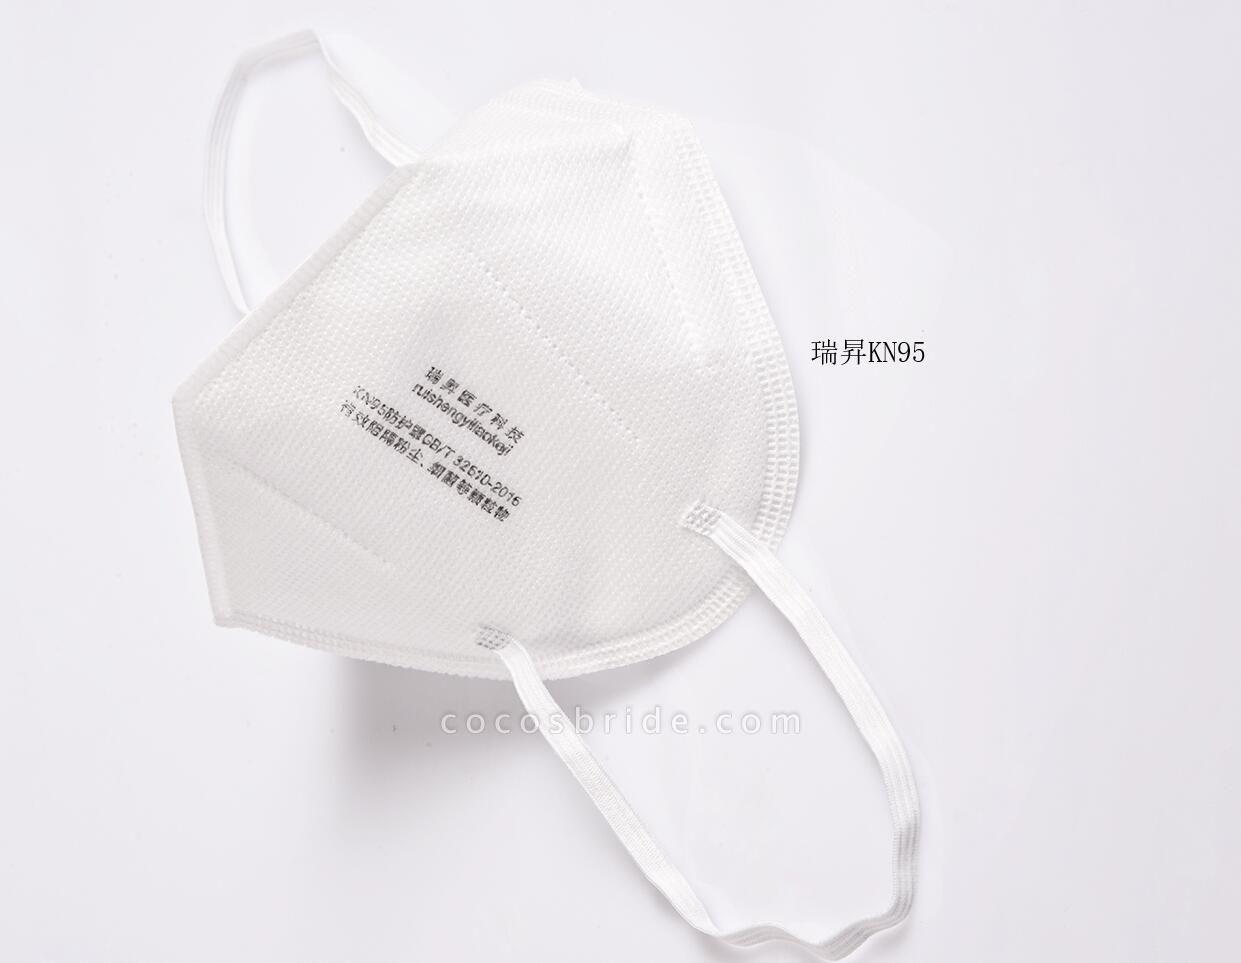 KN95 Protective Dustproof Respirators Face Masks 10 Pieces